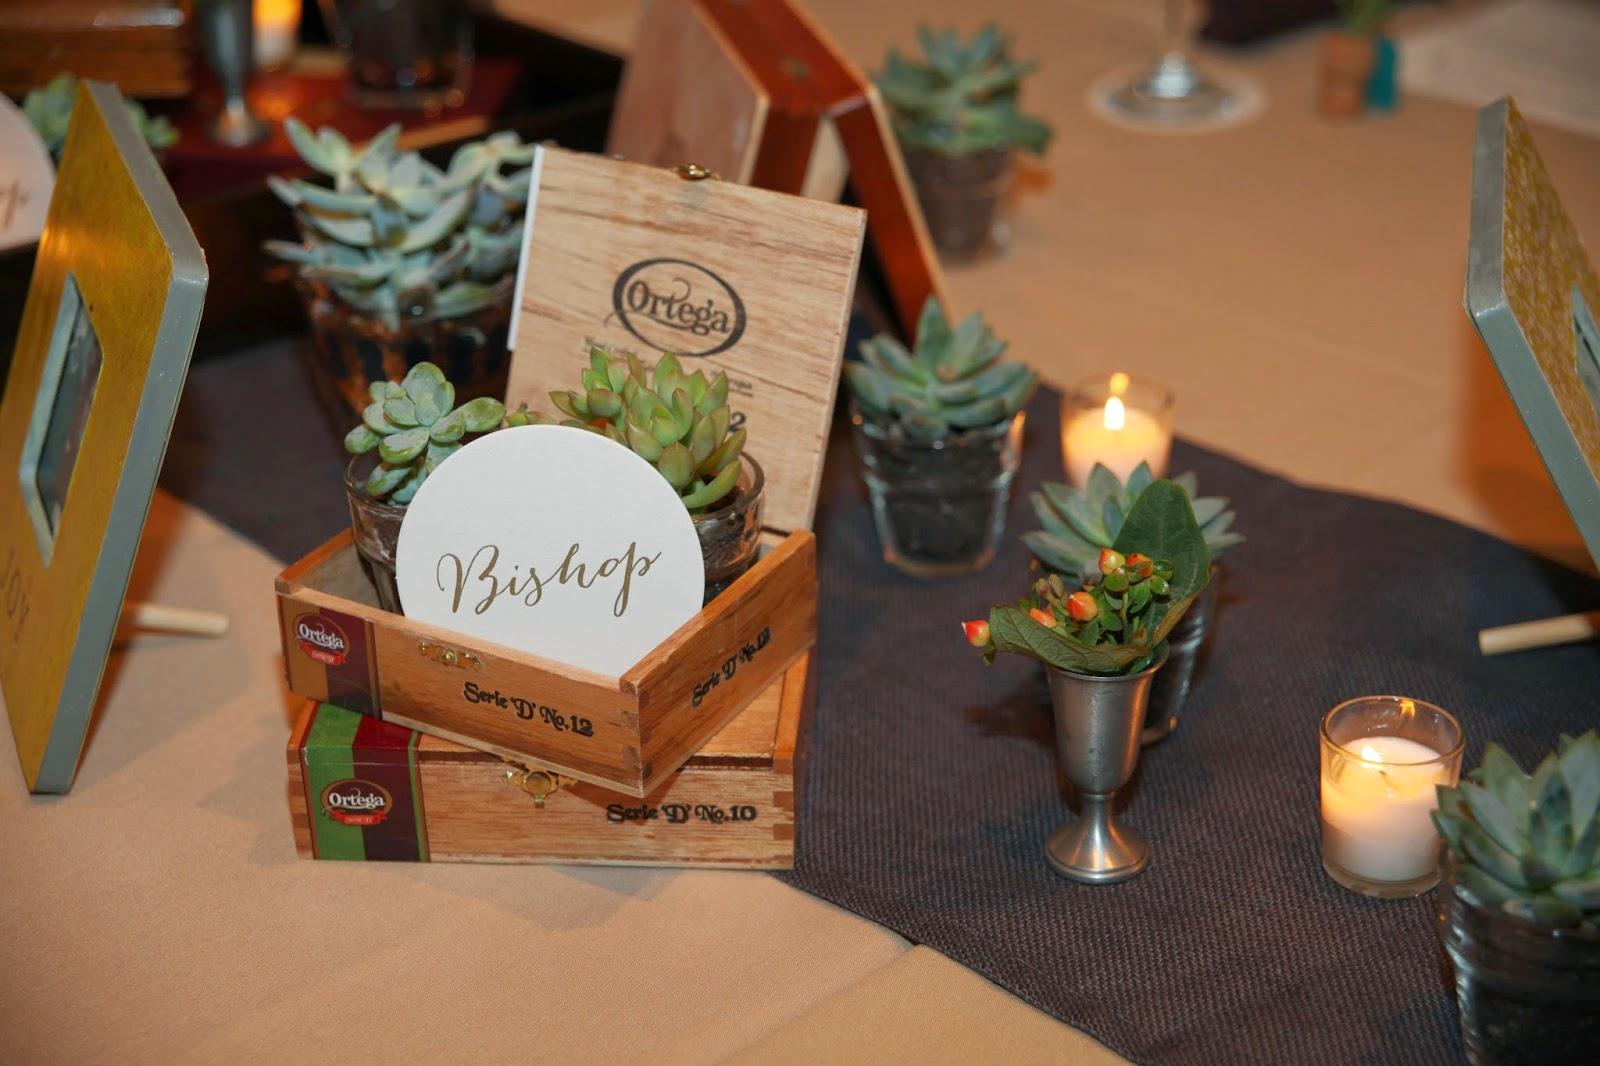 cigar box as wedding reception table decorations